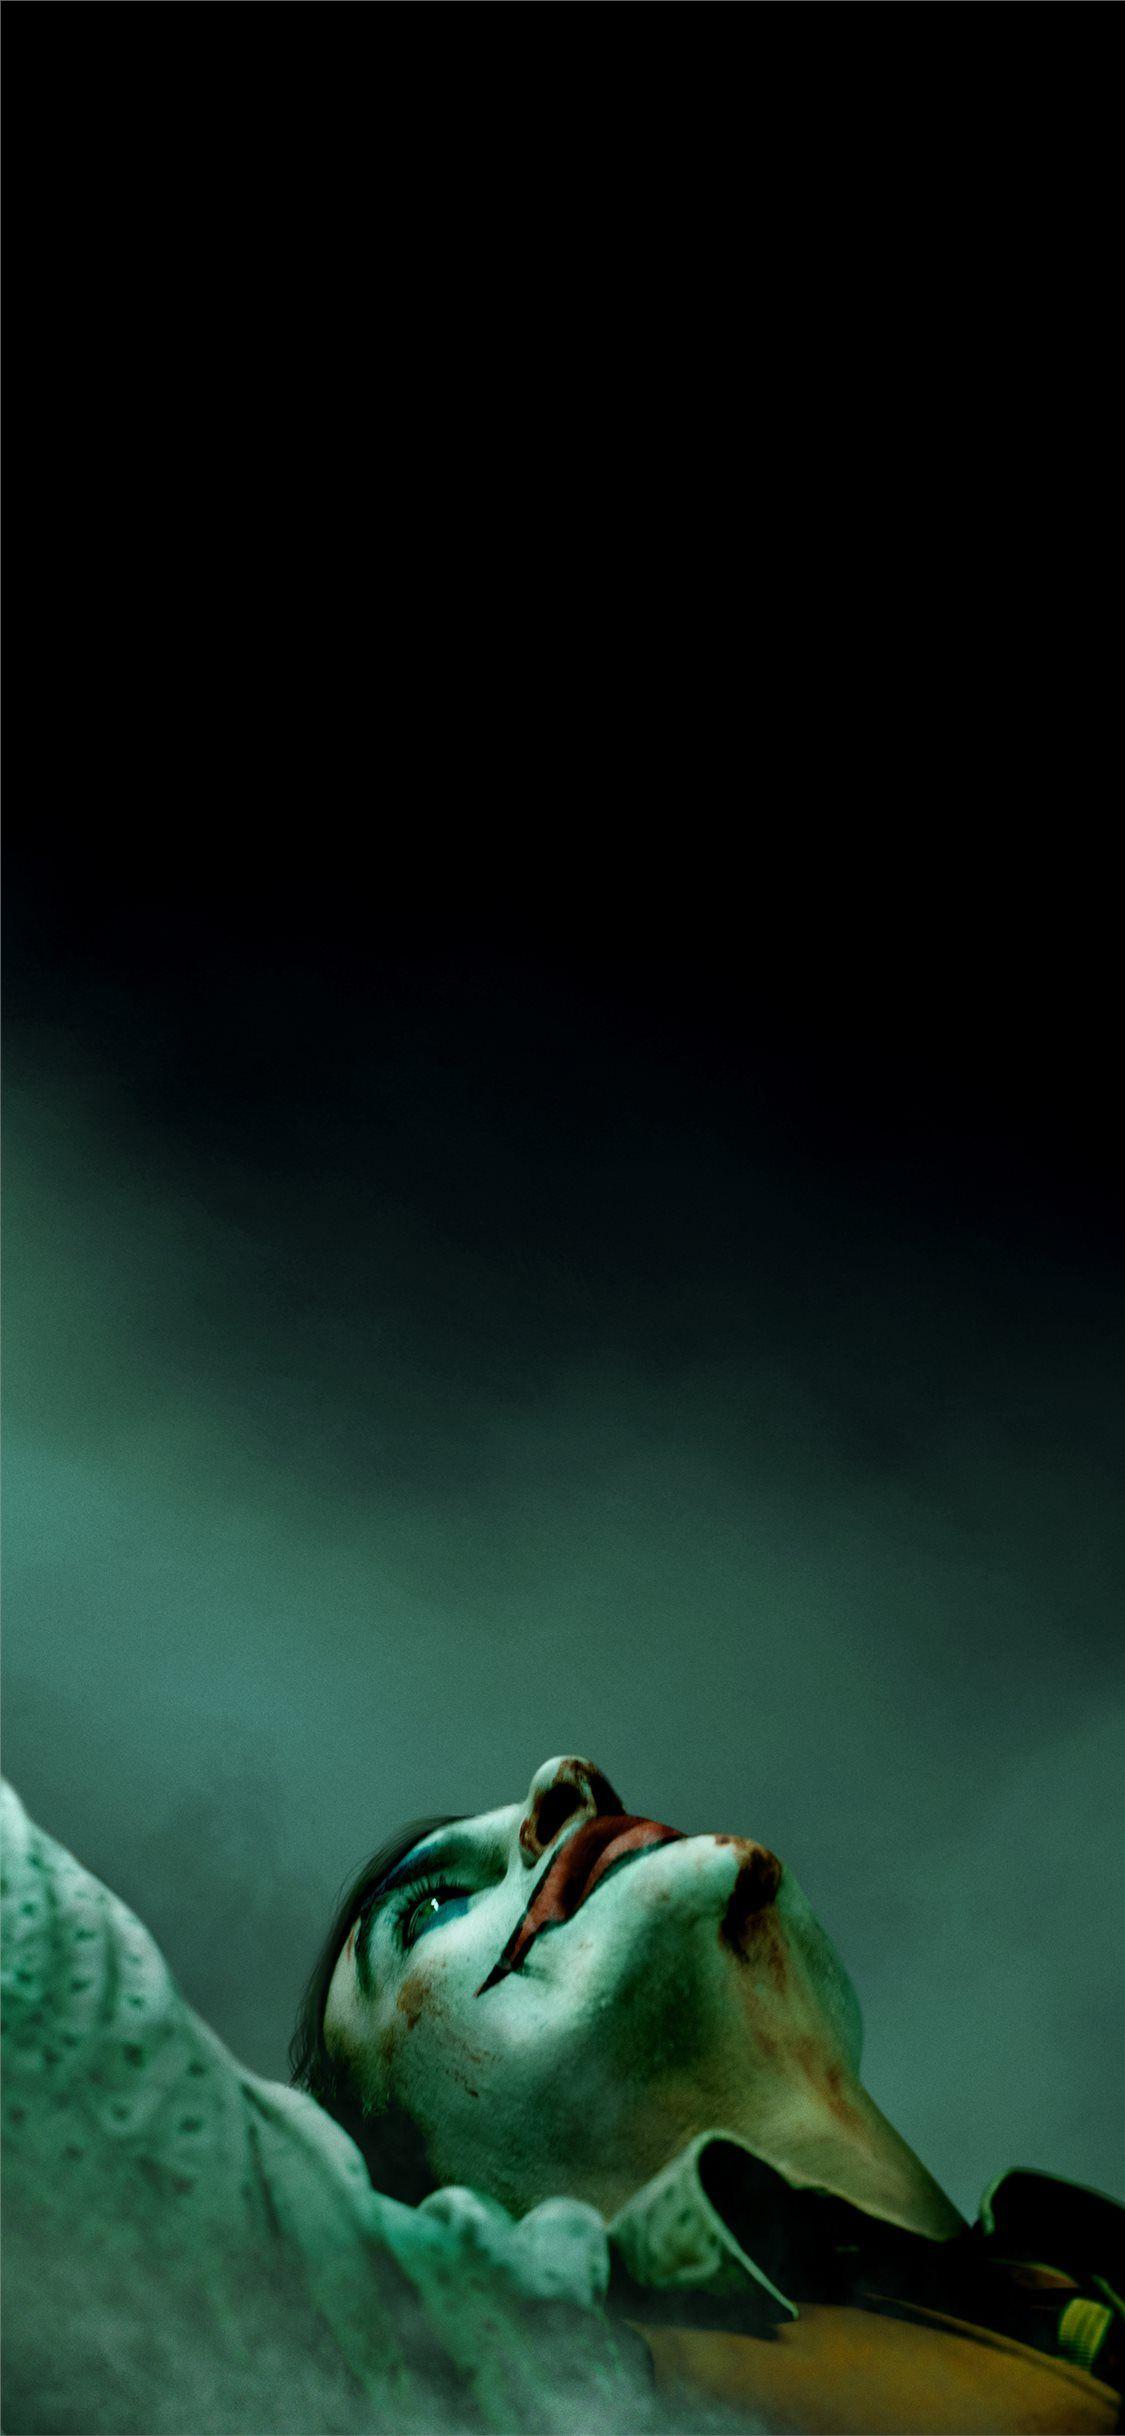 joker movie 4k iPhone X Wallpapers Joker poster, Joker